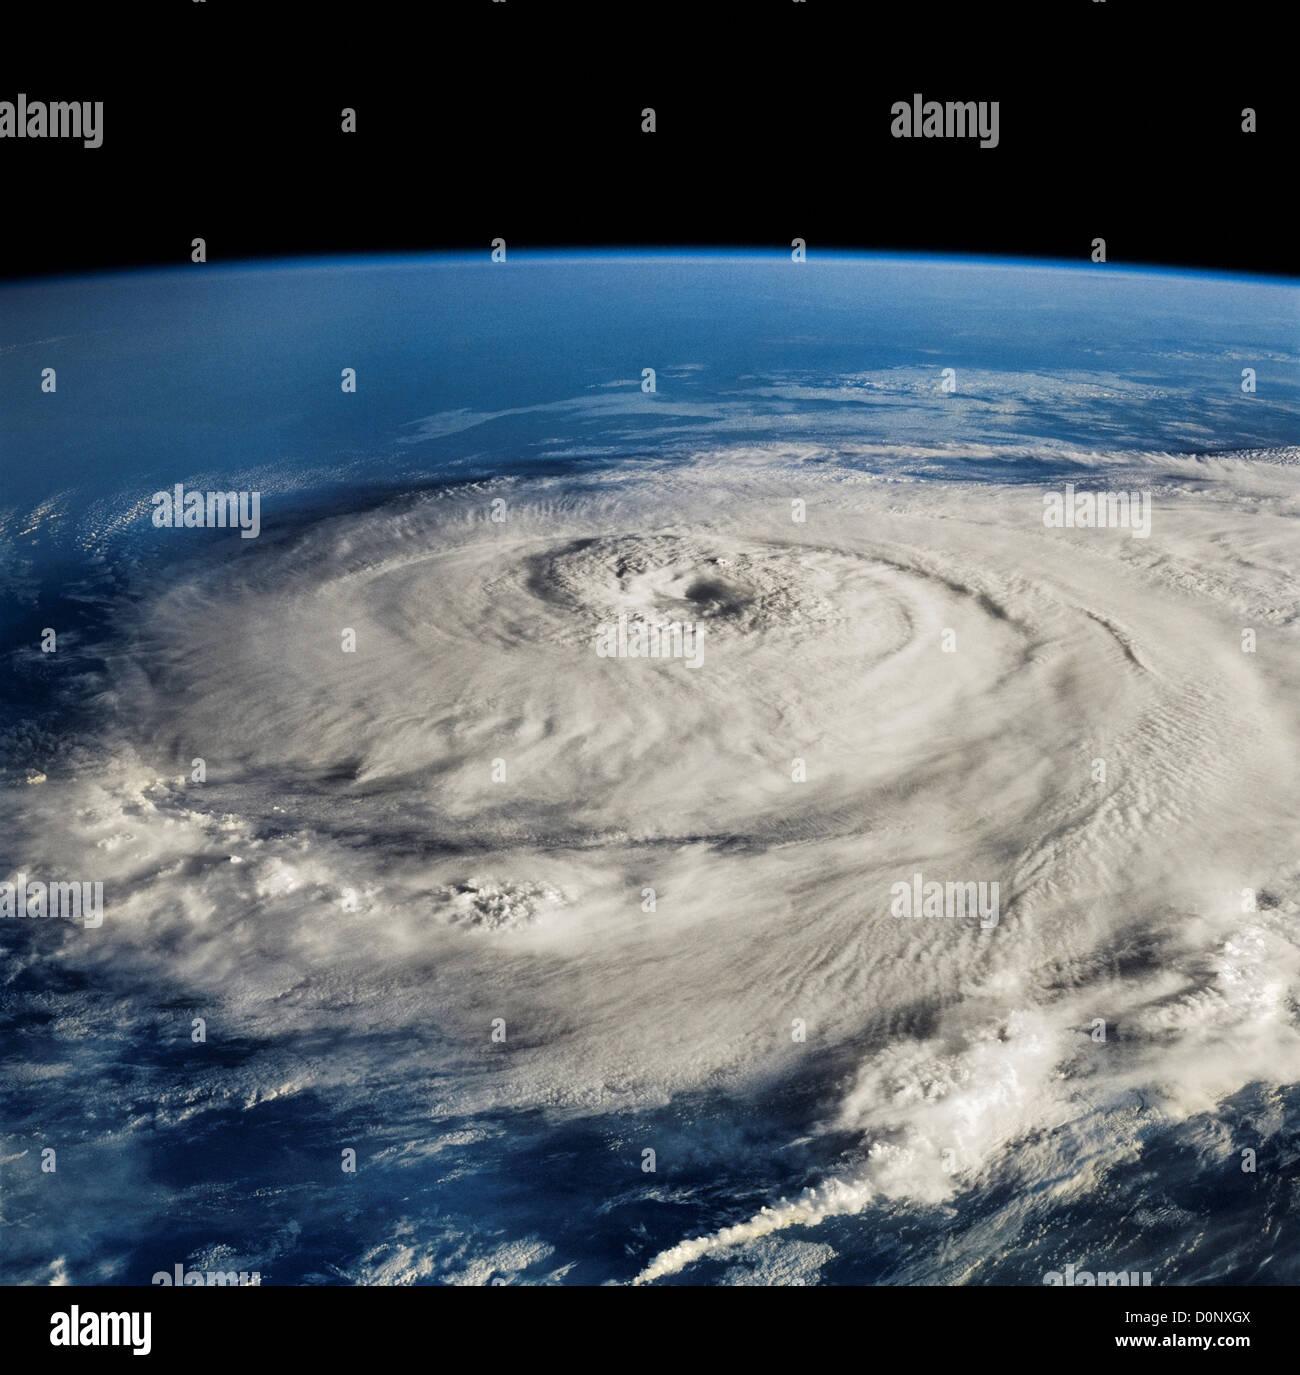 Hurrikan-Elena vom Space Shuttle Discovery aus gesehen Stockbild